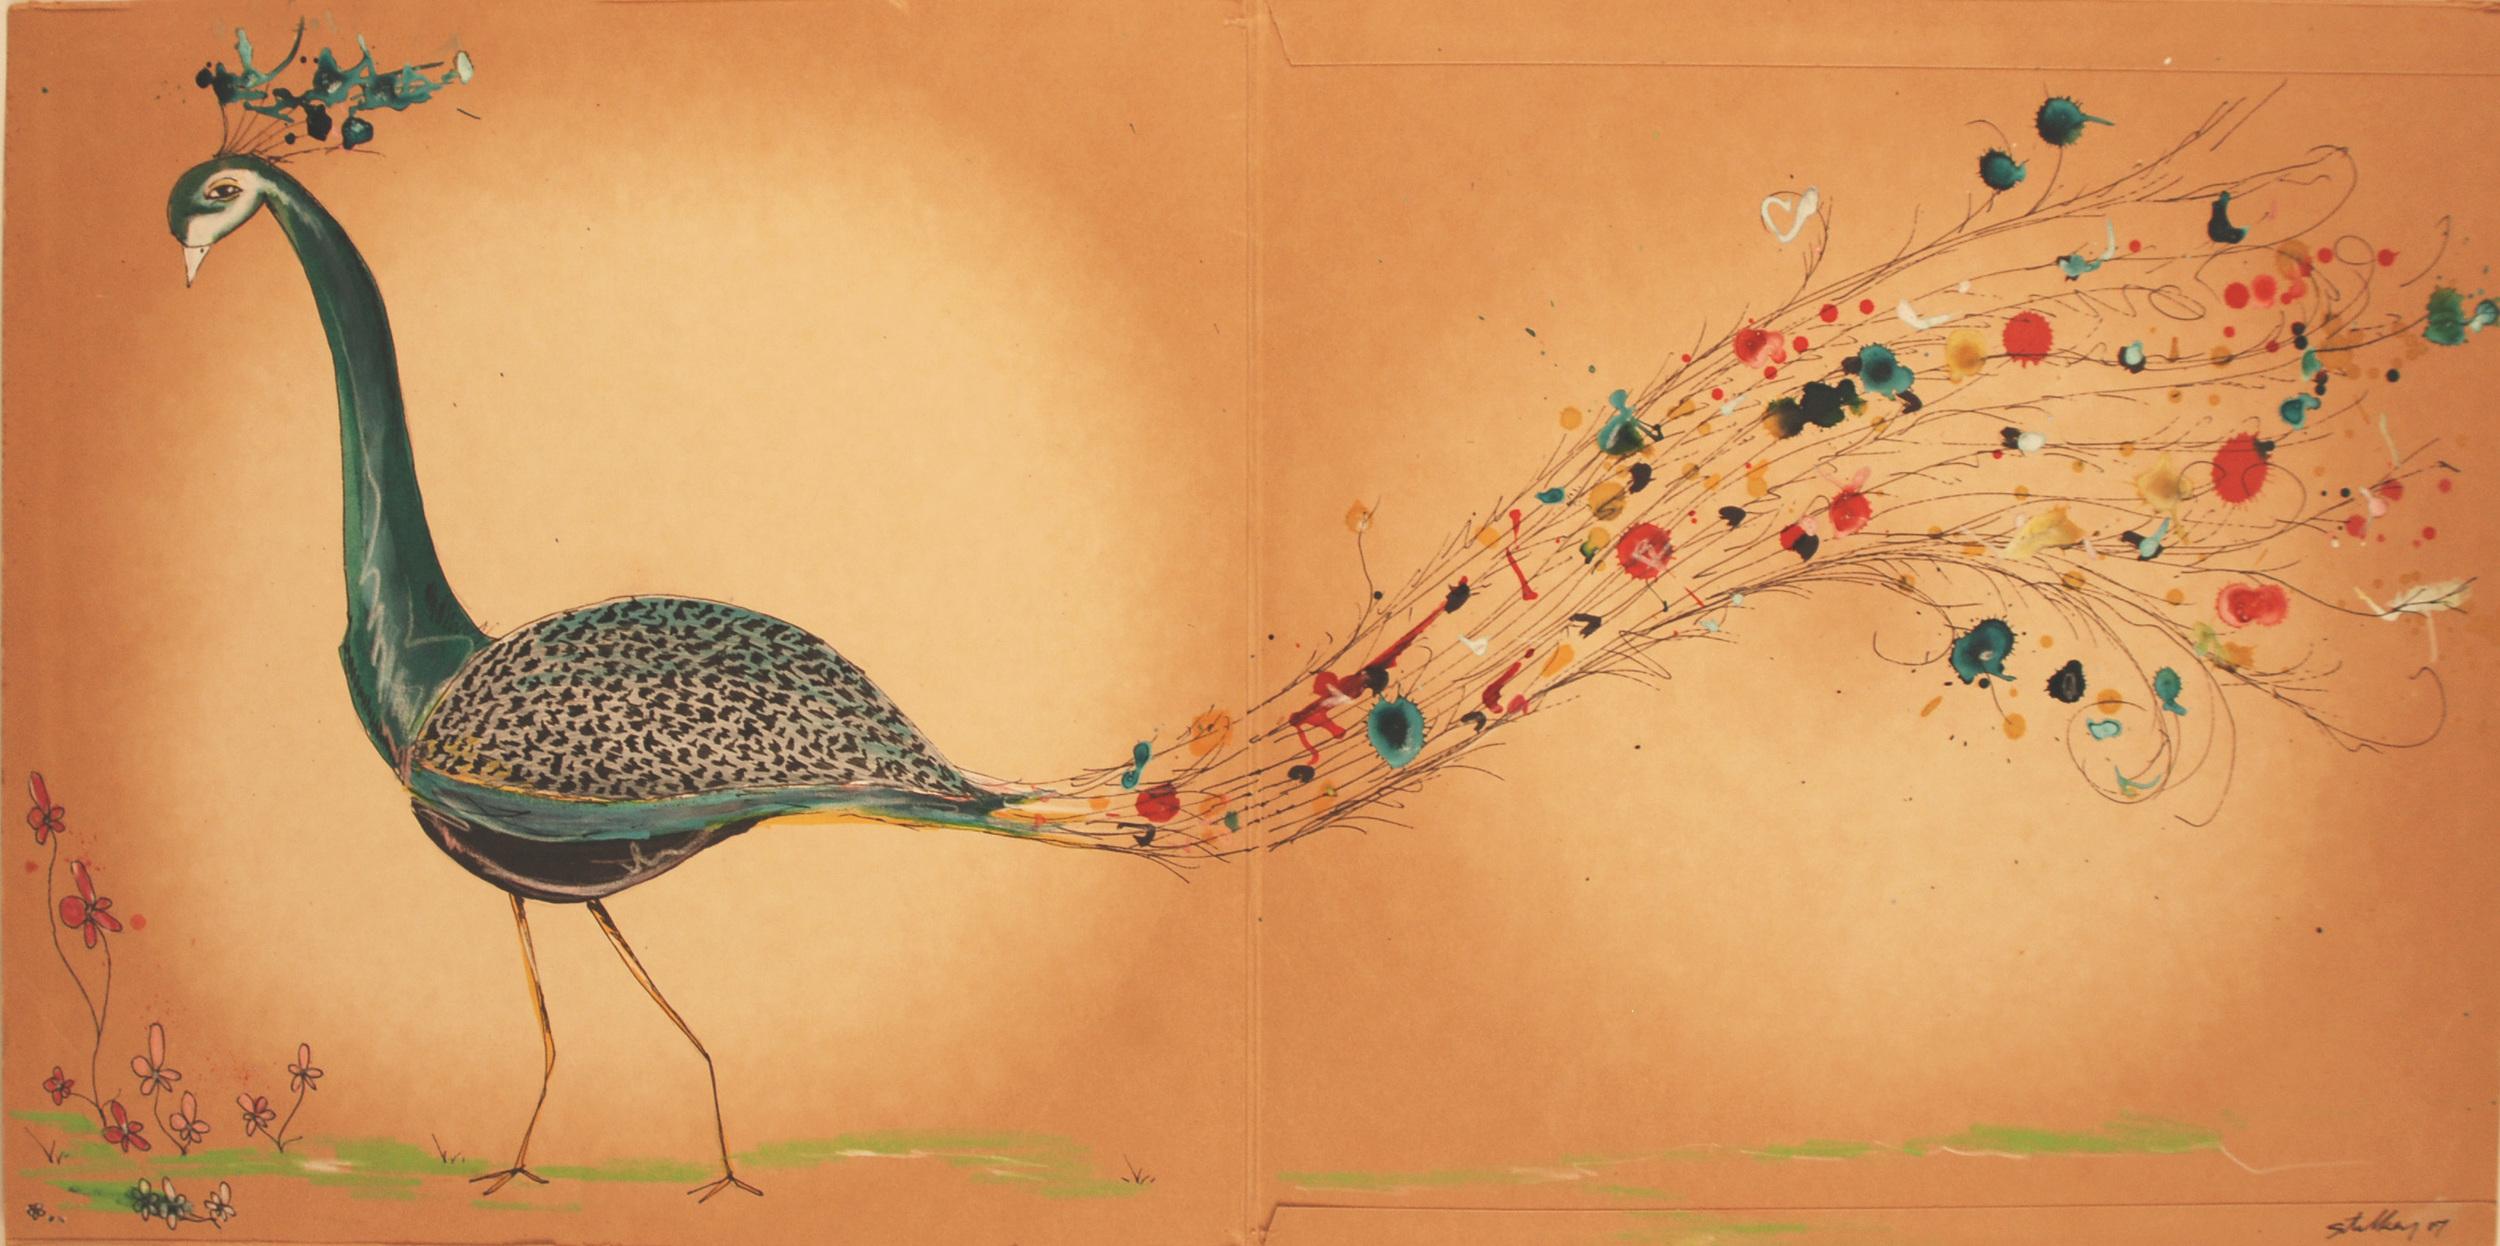 Peacock | Mike Stilkey